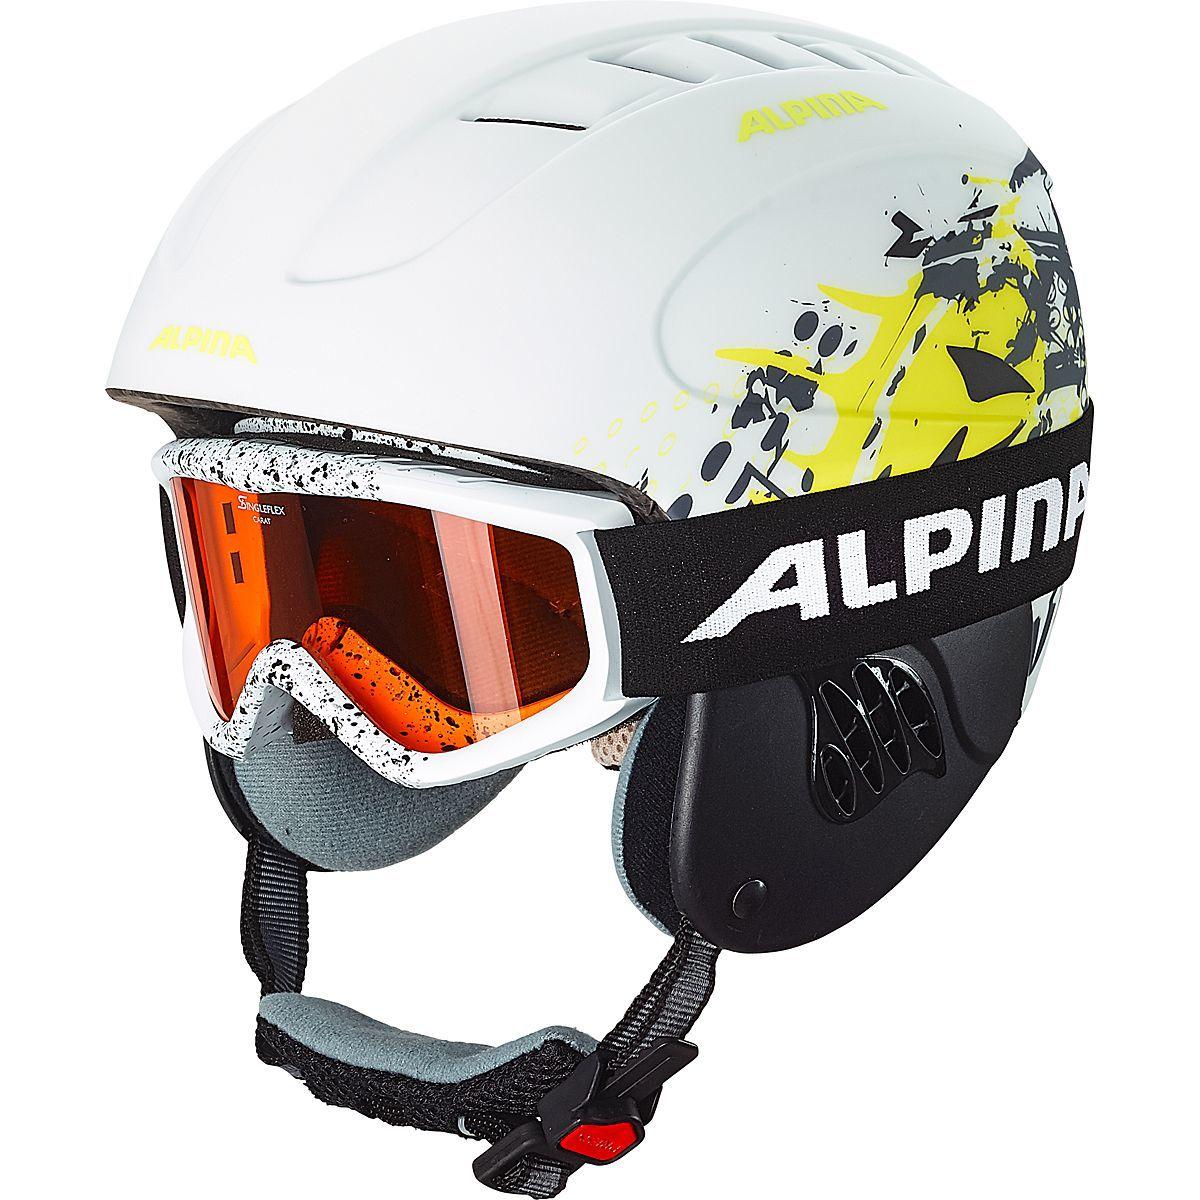 "Alpina™ - Kinder Skihelm ""Carat LE"" (Weiß,Größe 48-52cm) ab €14,37 [@Karstadt.de]"